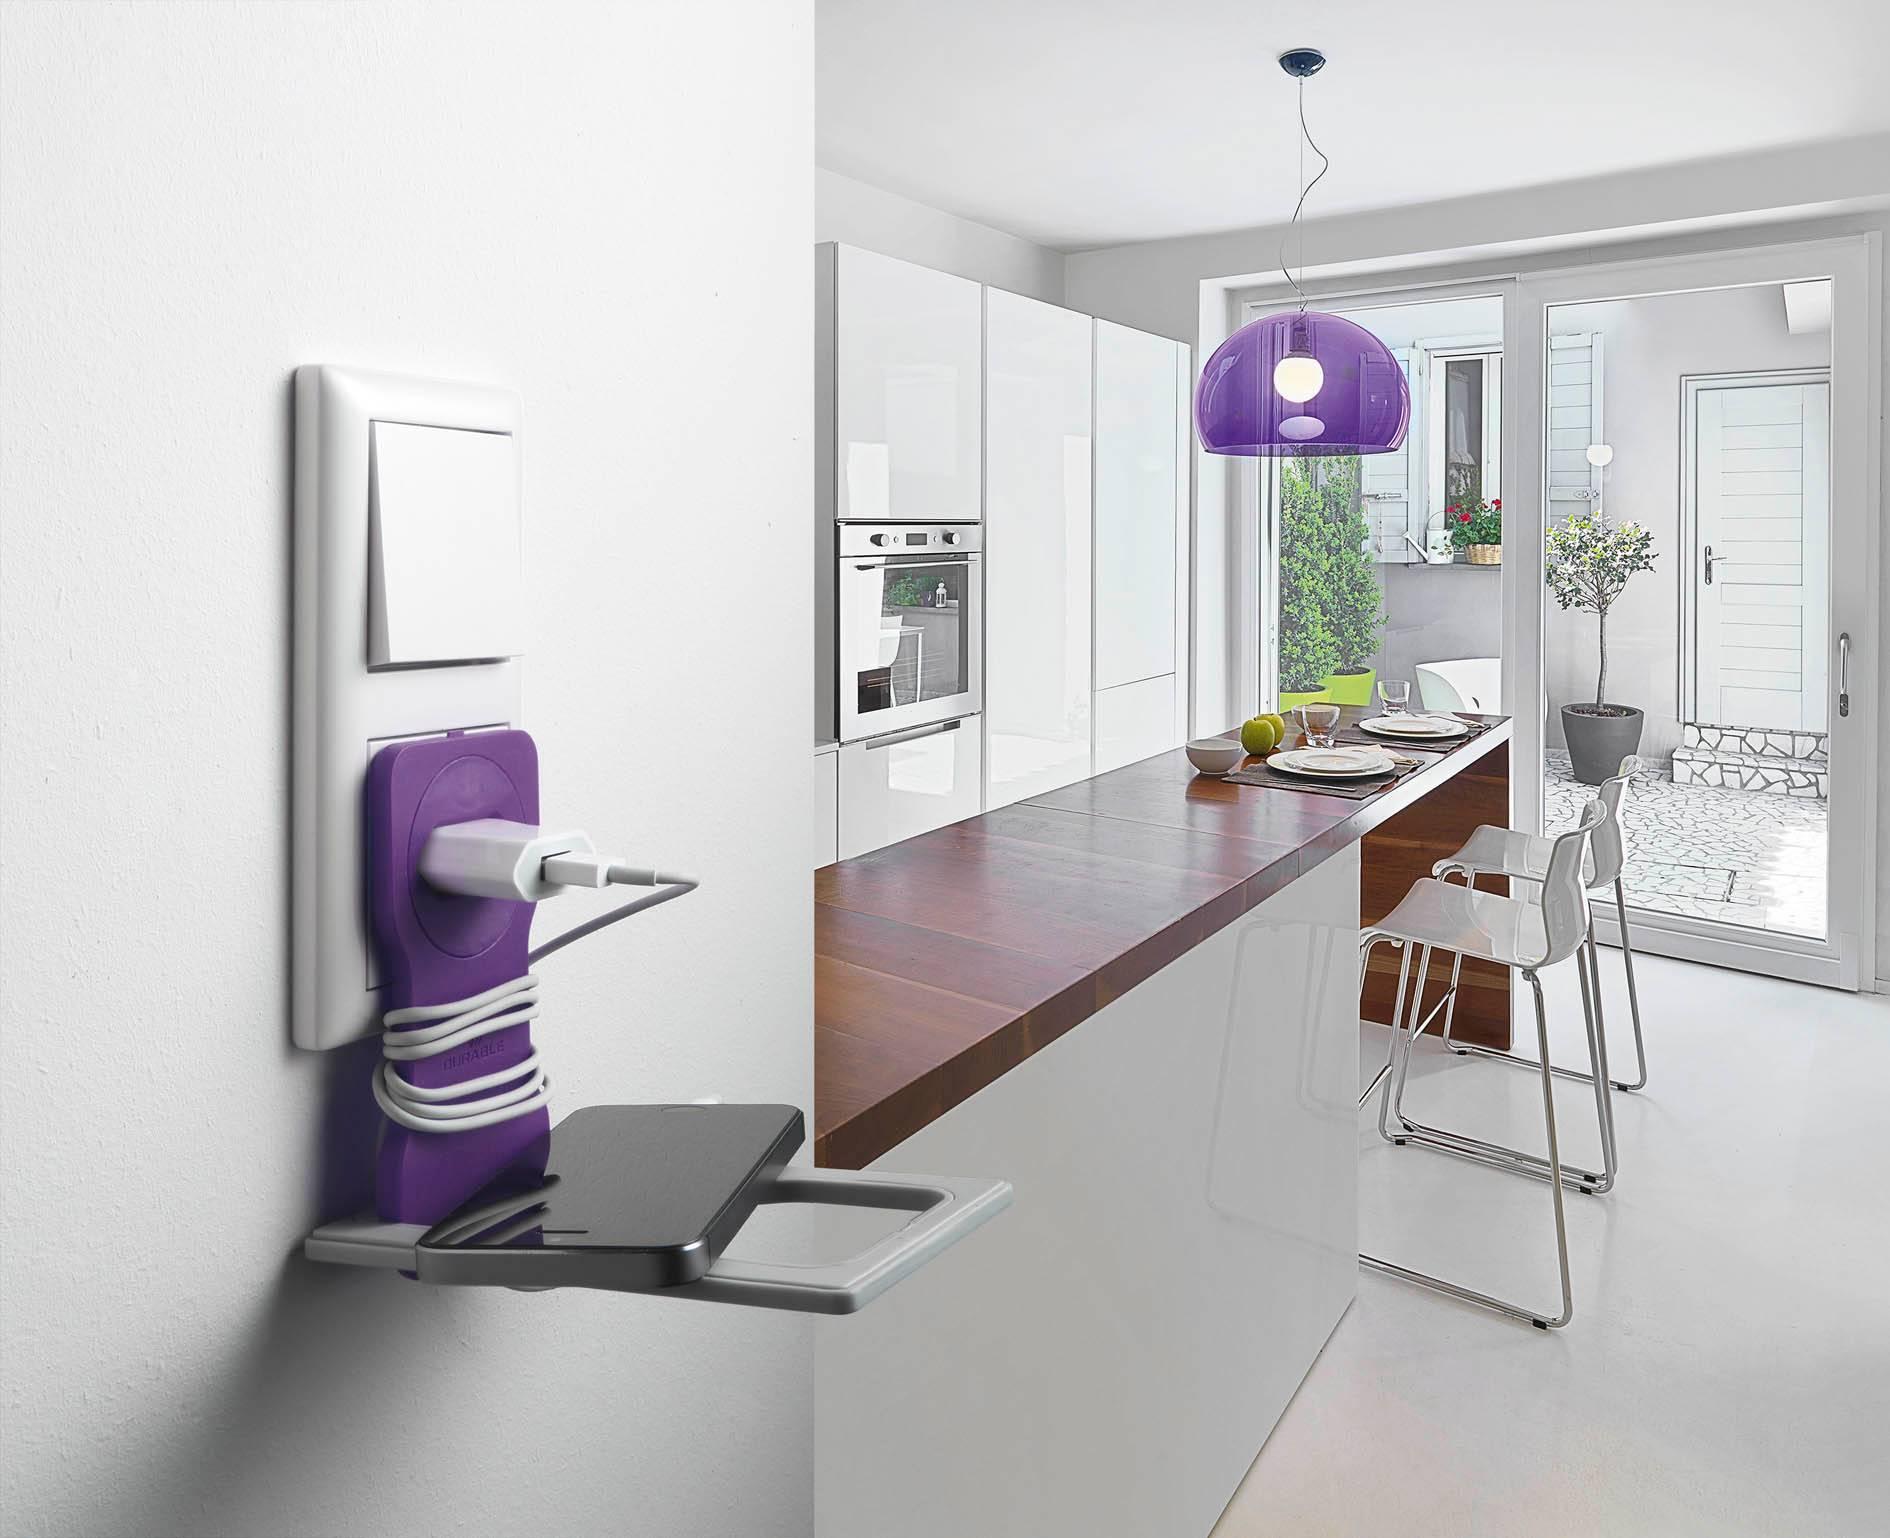 Подставка Durable 7735-12 Varicolor фиолетовый/серый - фото 5